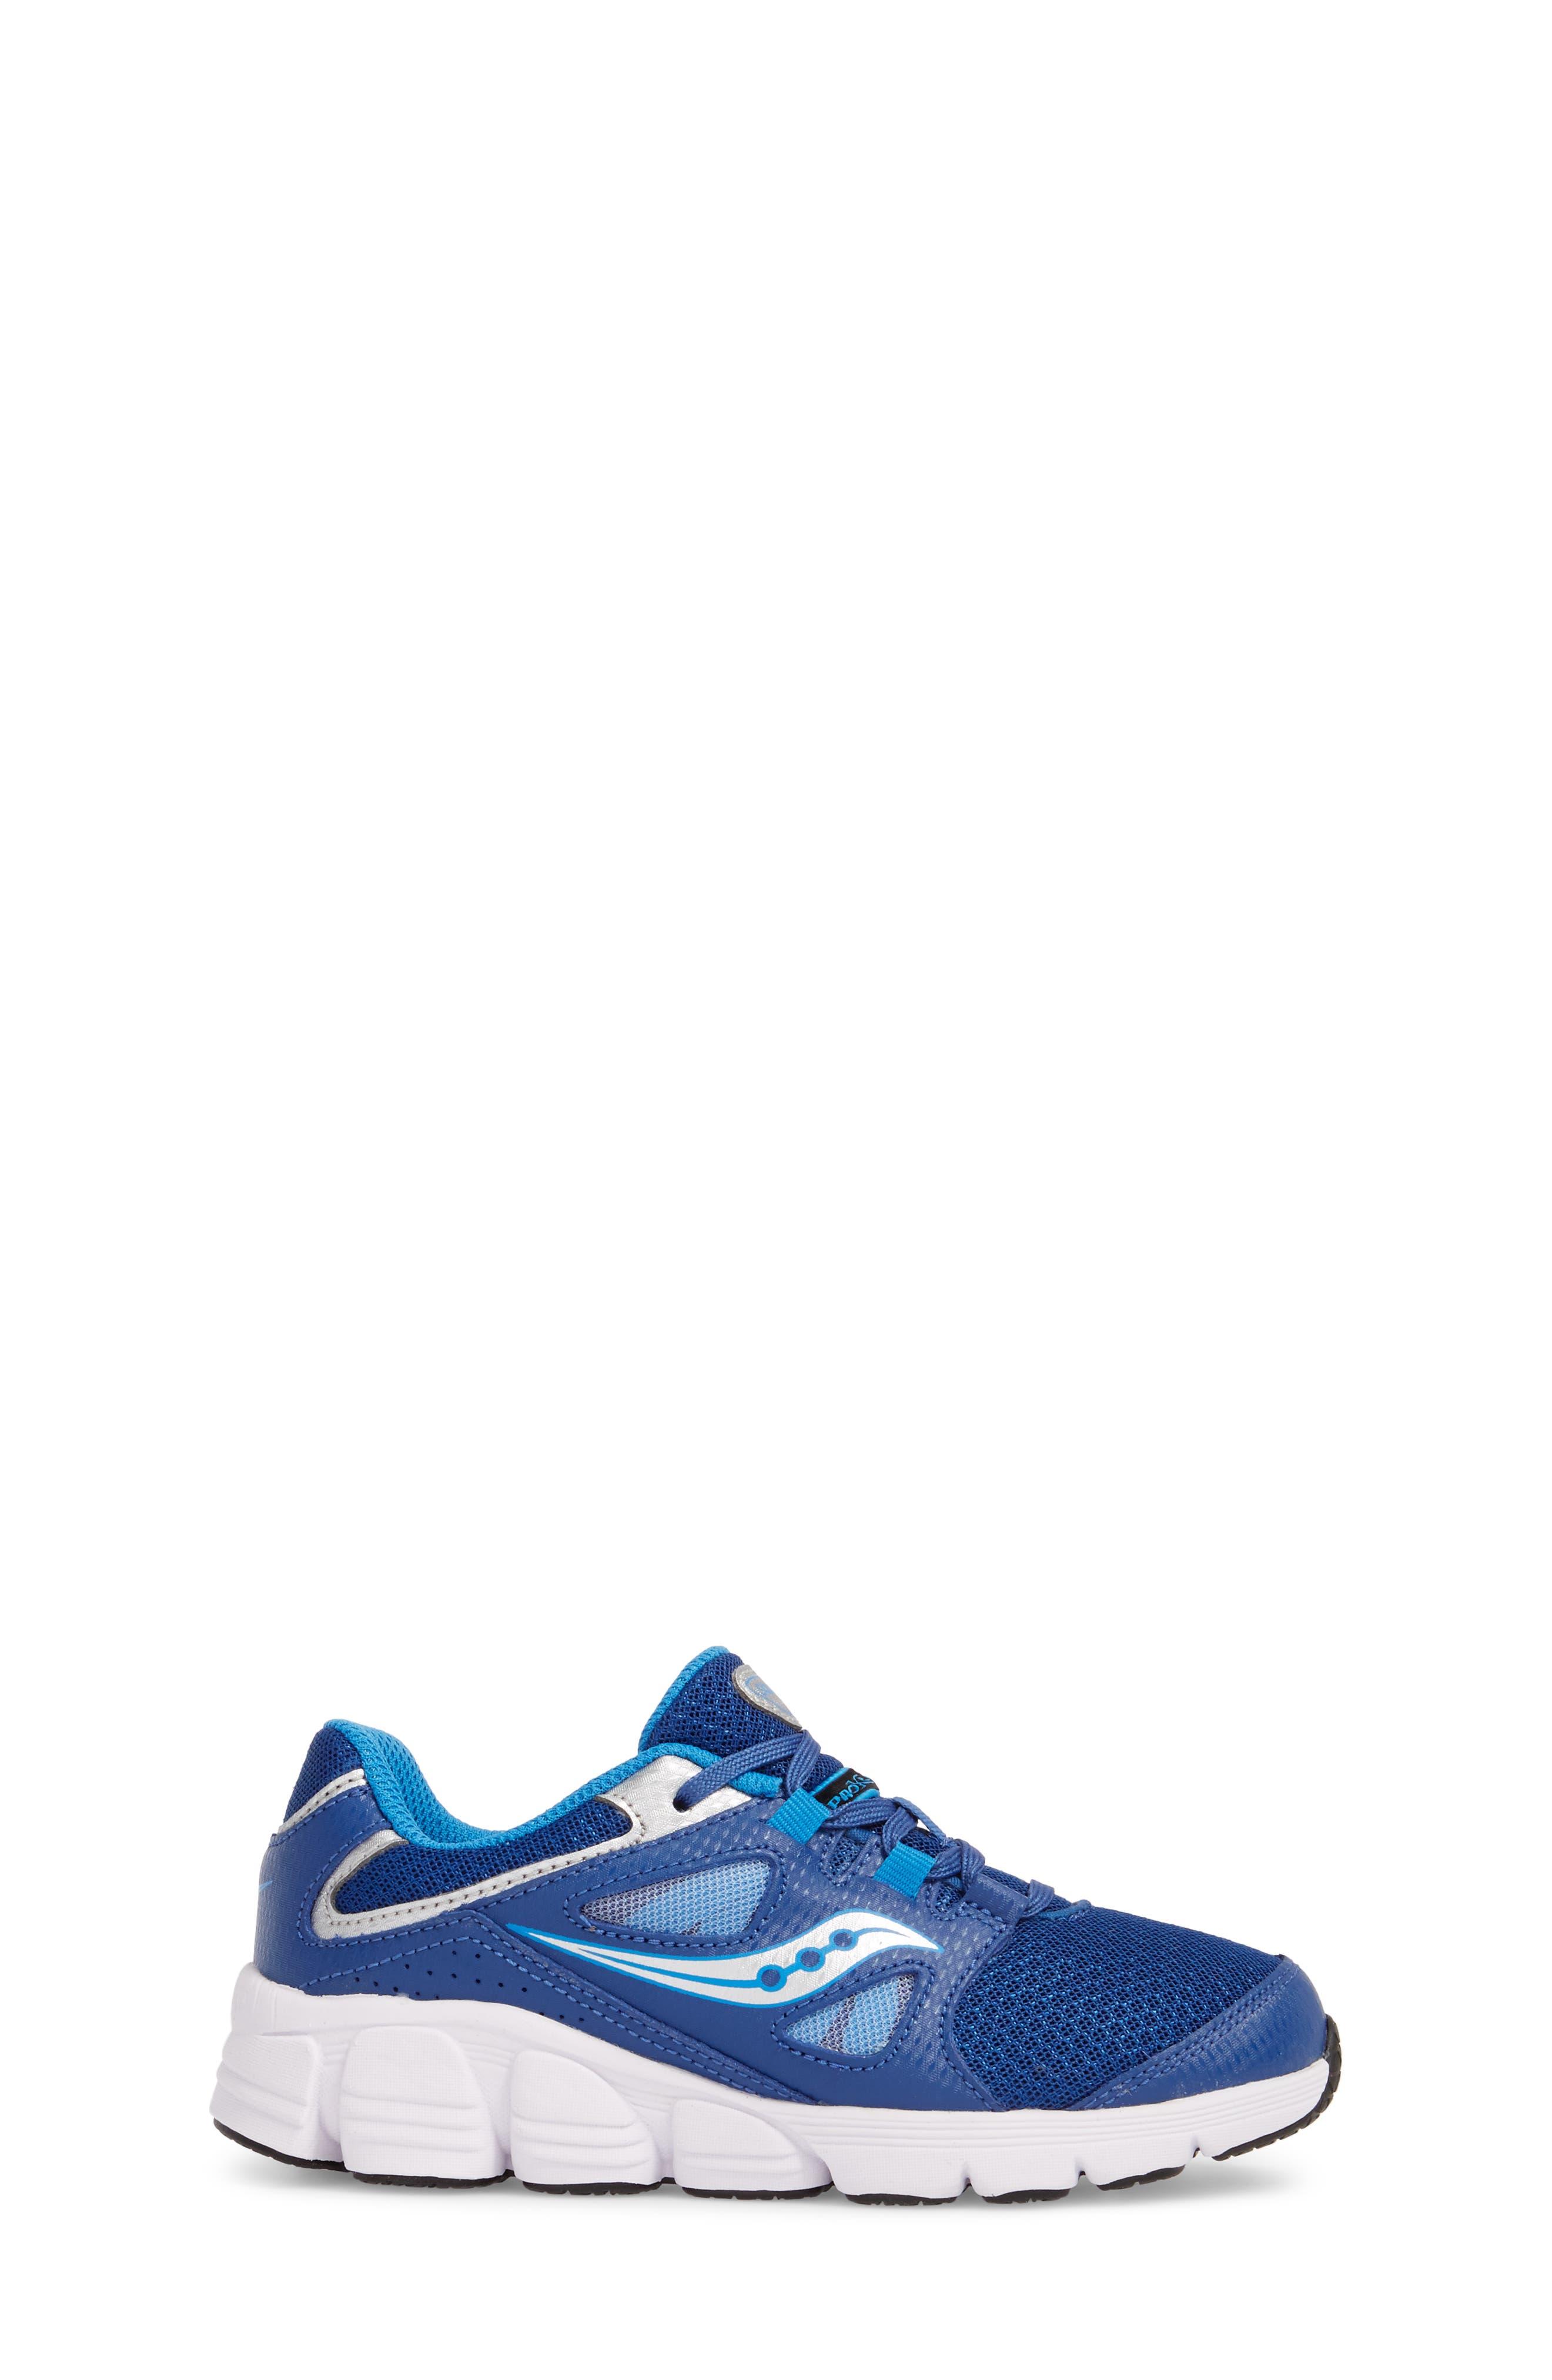 Kotaro 4 Sneaker,                             Alternate thumbnail 3, color,                             400